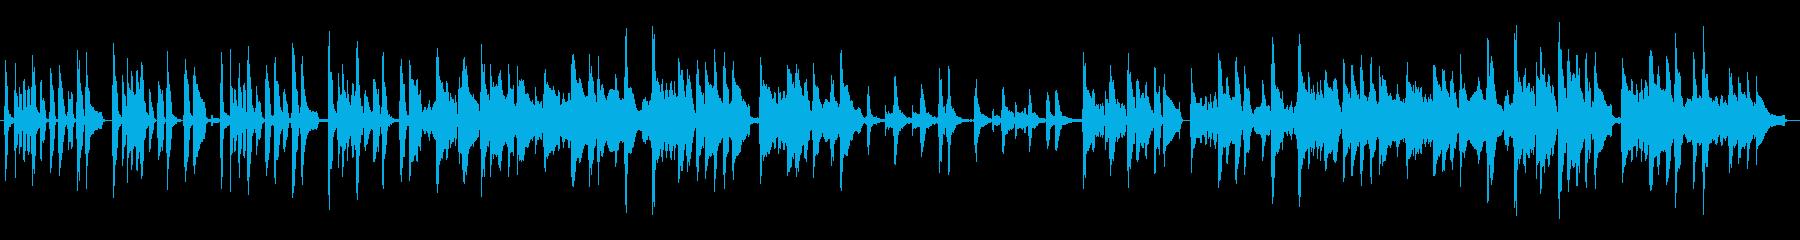 T.V.-現実-軽い緊張-こっそり...の再生済みの波形